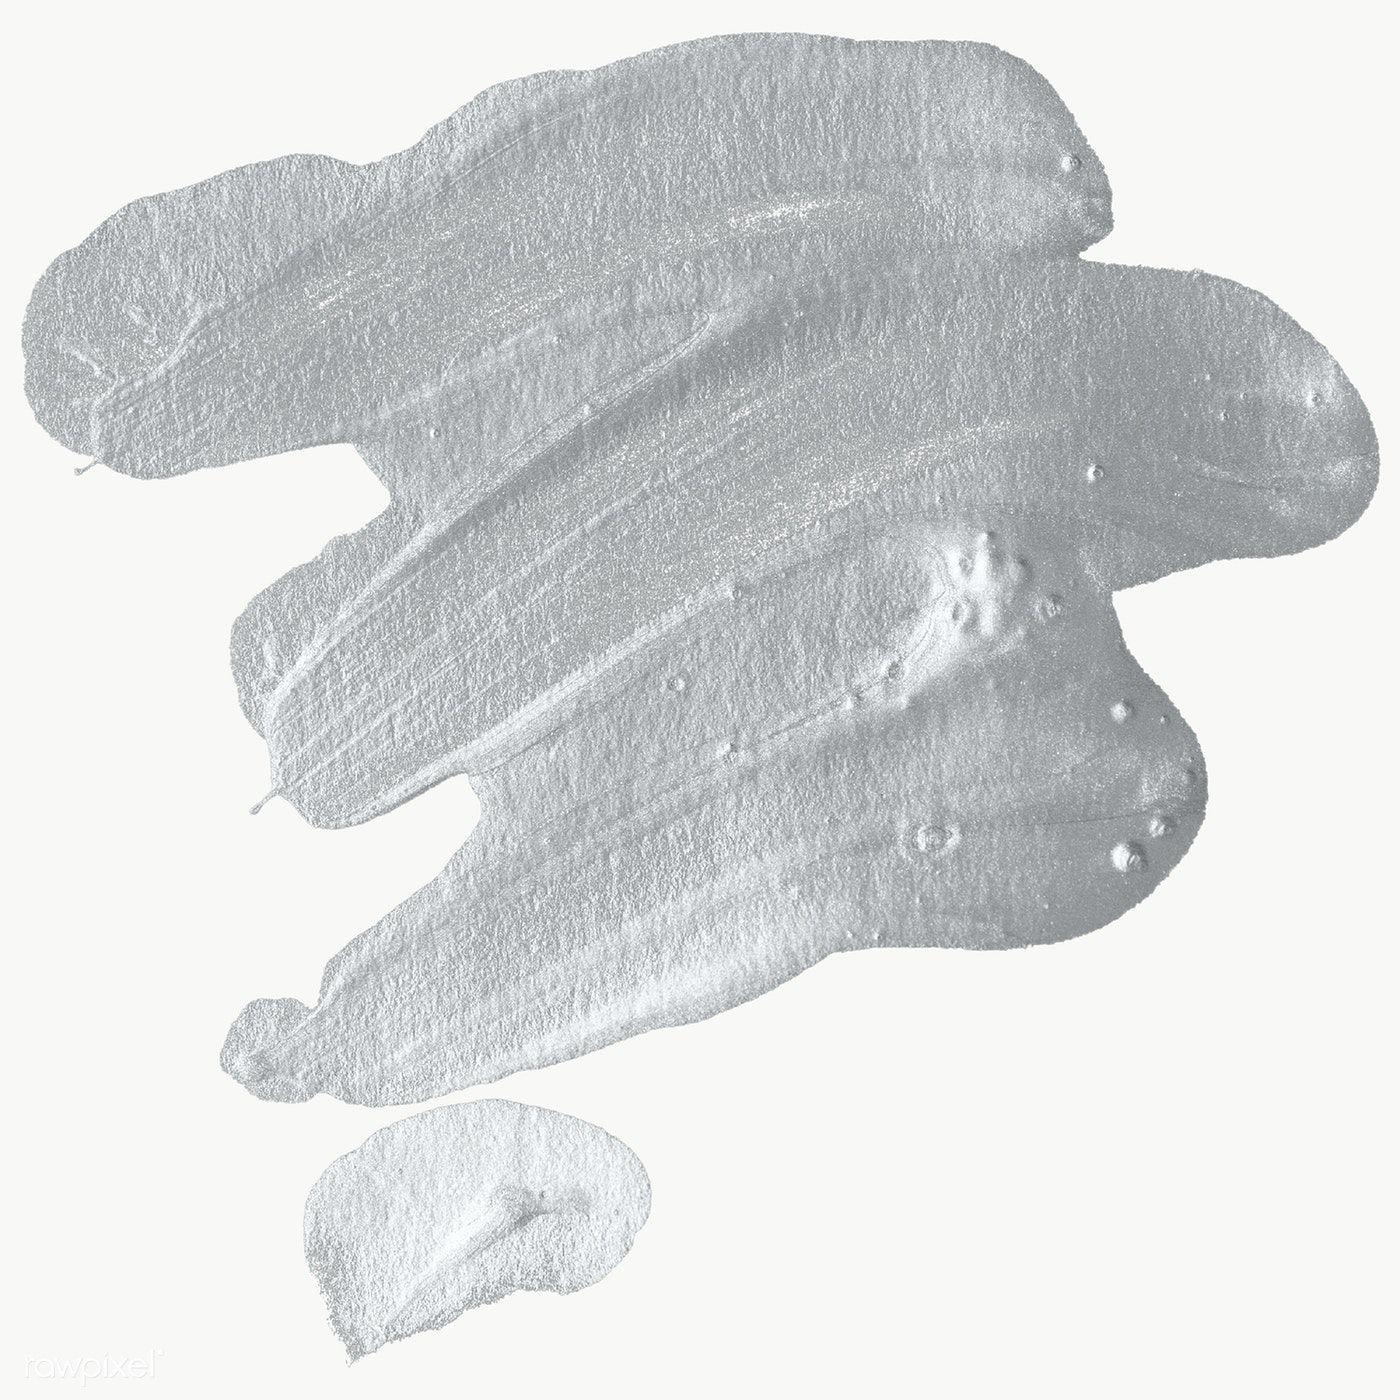 Metallic Gray Brush Stroke Transparent Png Free Image By Rawpixel Com Nap Brush Strokes Brush Stroke Png Texture Painting